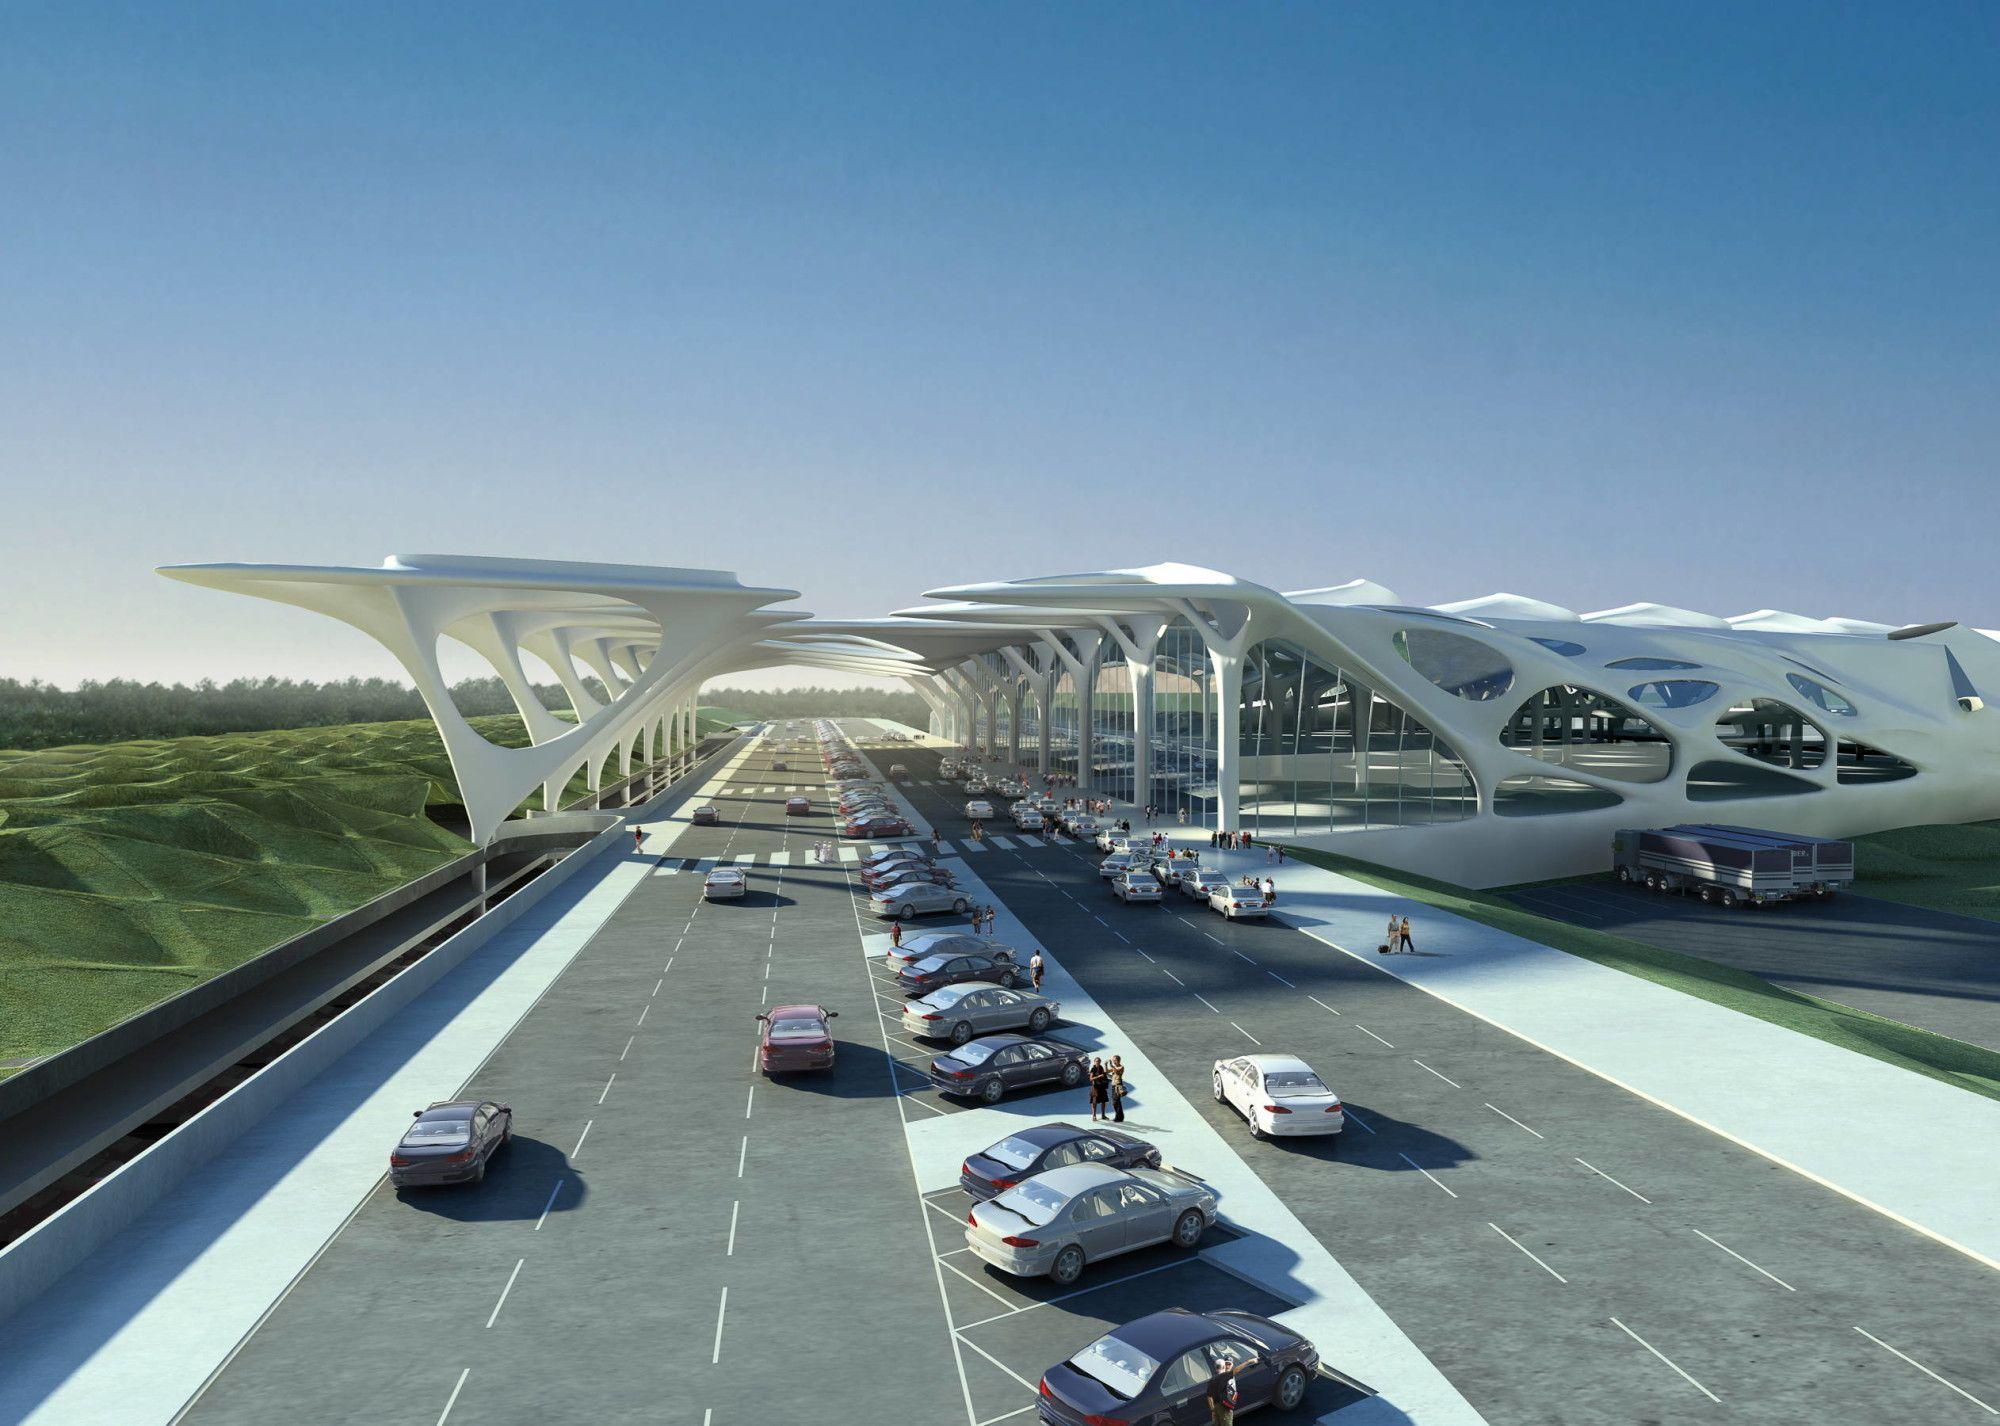 Zagreb Airport Zaha Hadid Architects Arch2o Com Zaha Hadid Architects Zaha Hadid Architecture Zaha Hadid